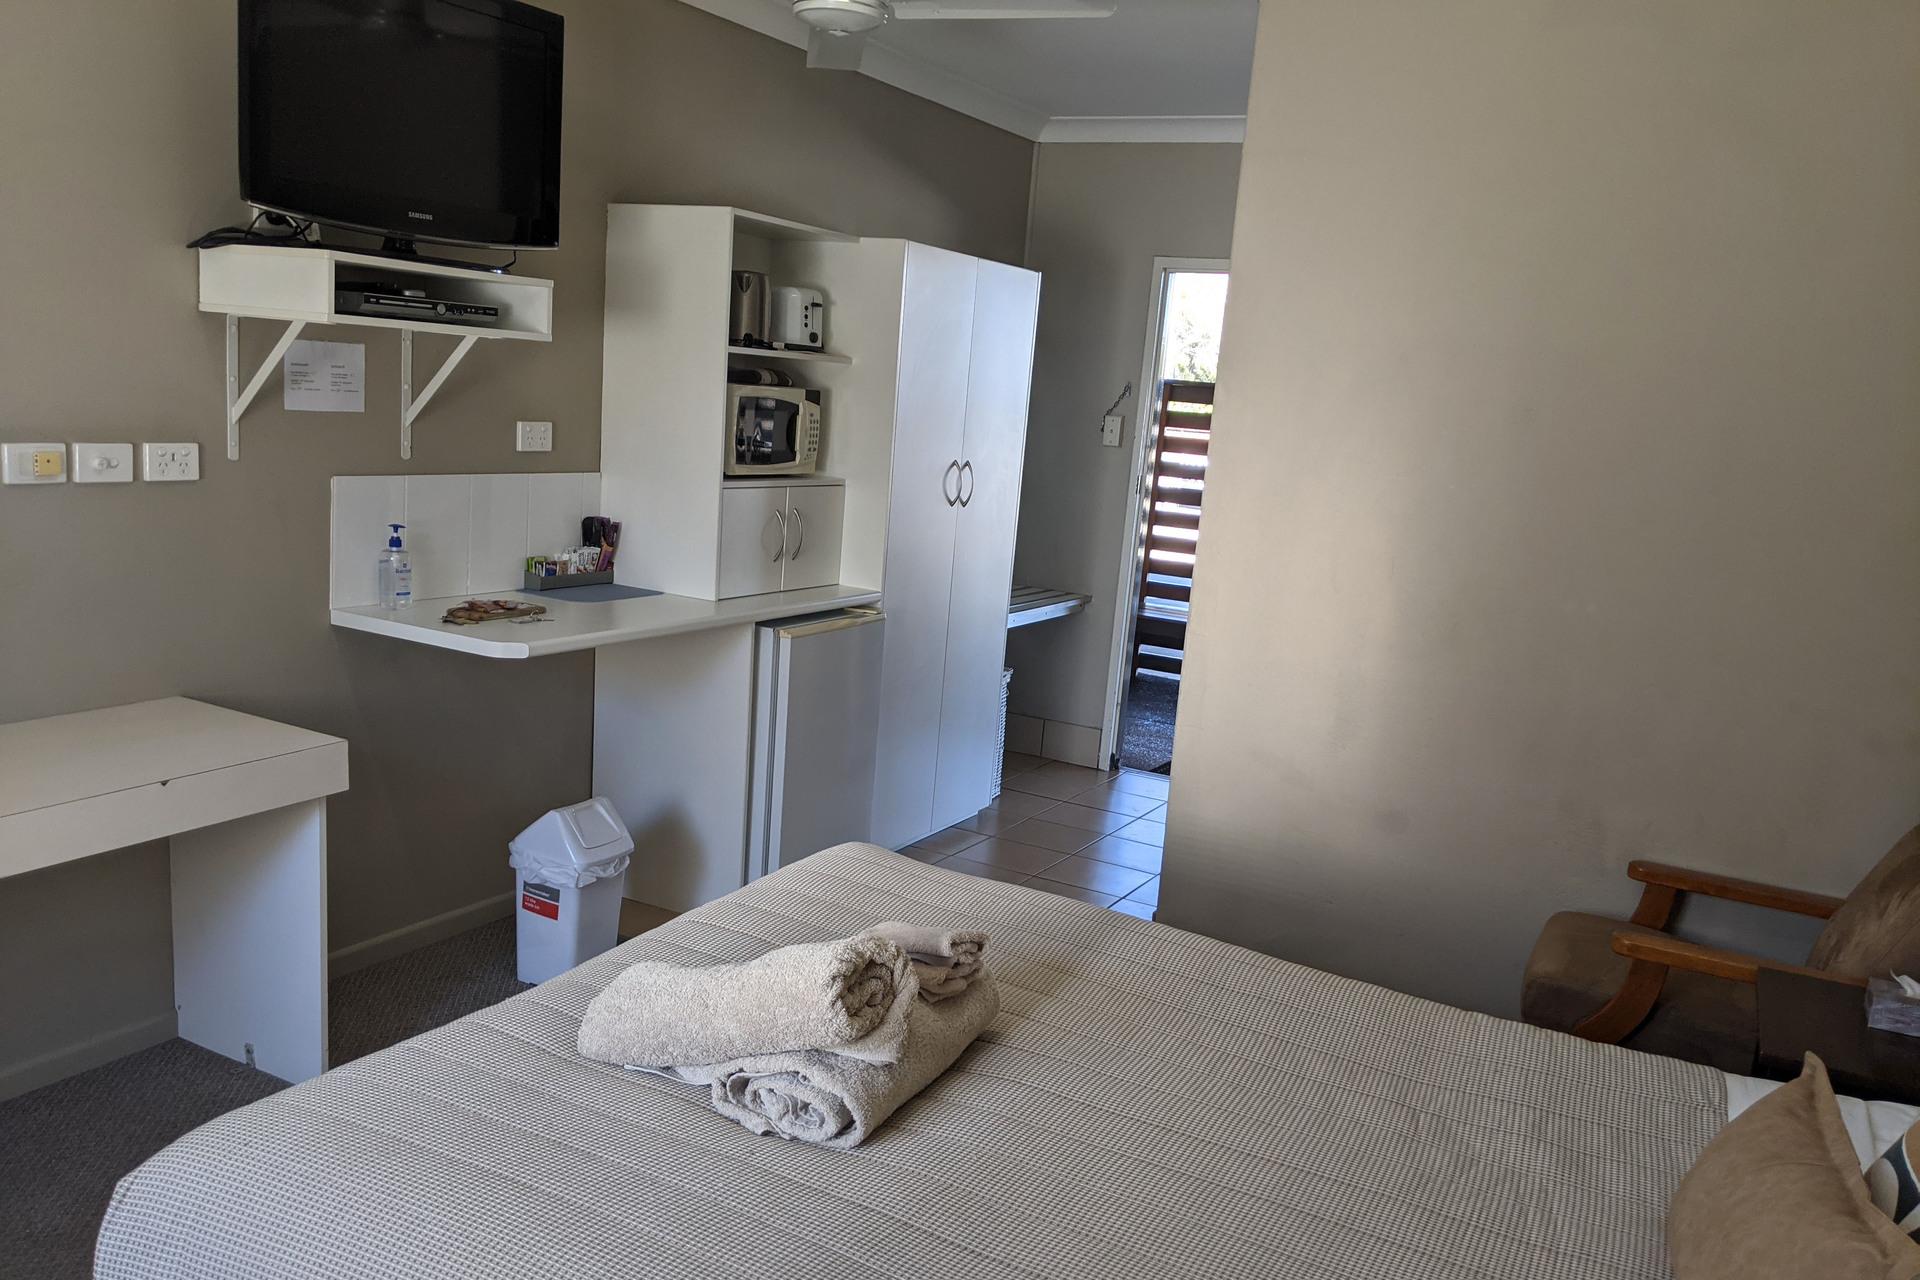 b - Kerry Court Motel